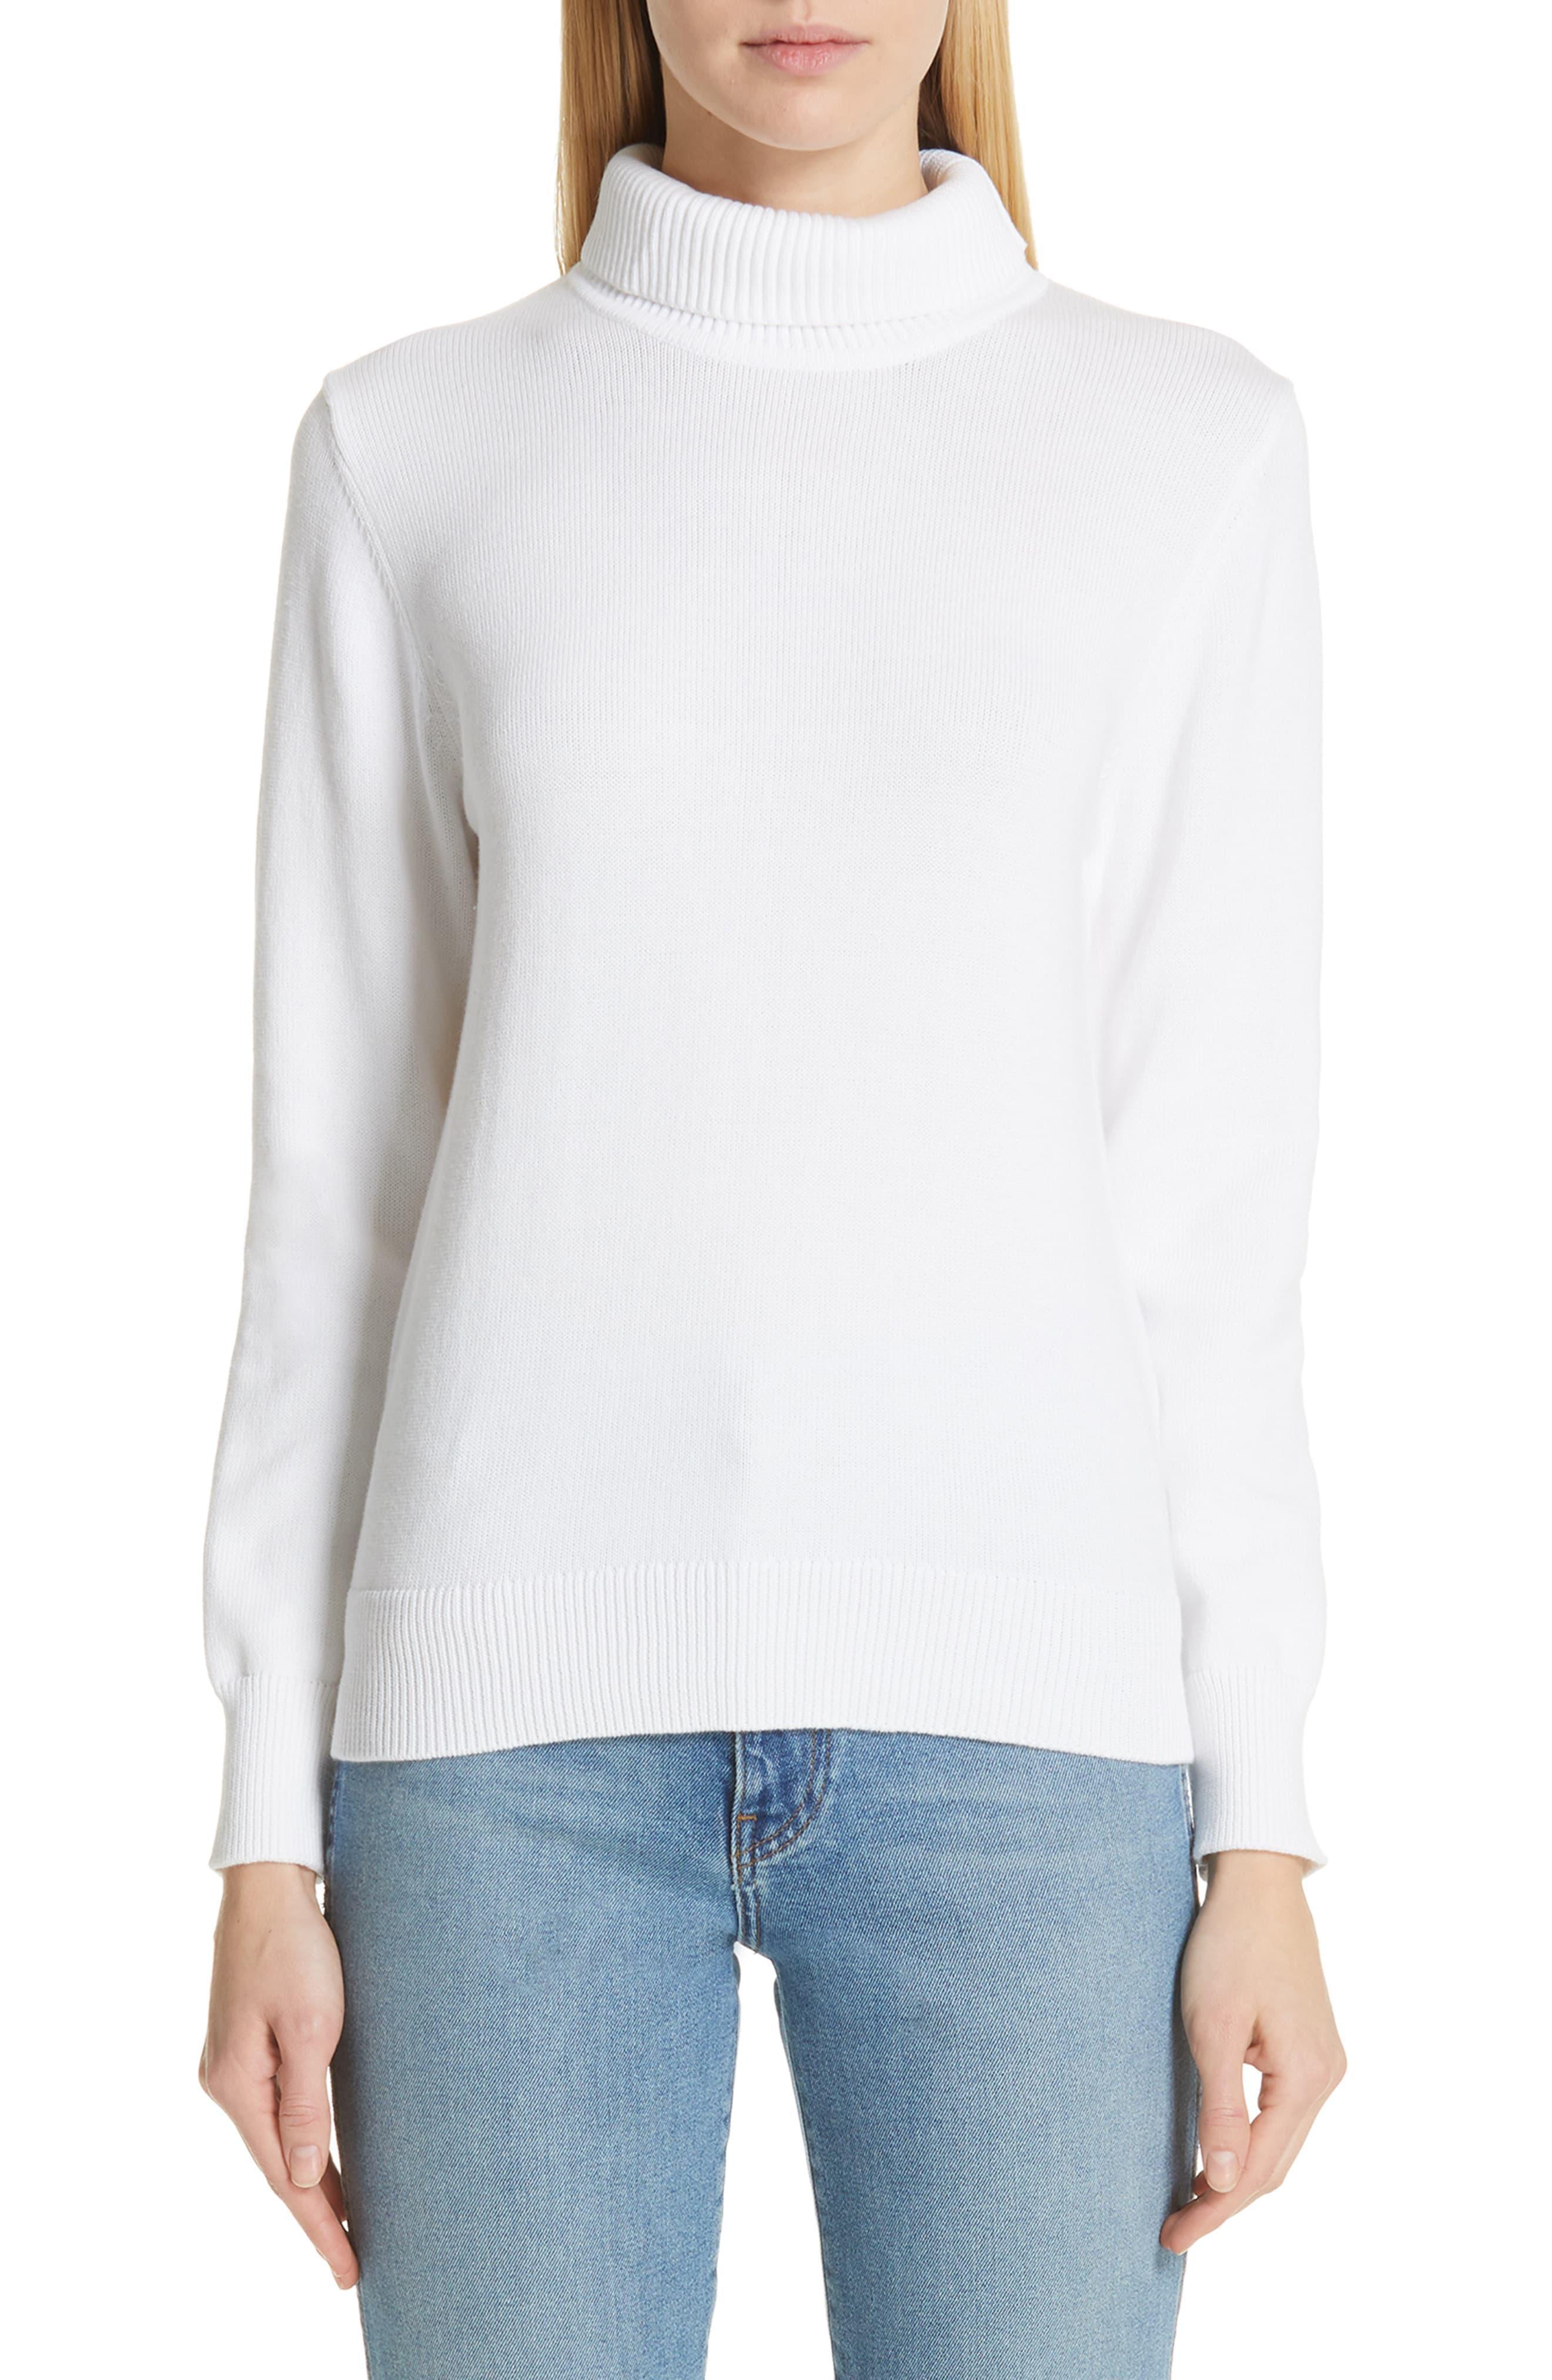 e4686efd5740cc Lyst - Simon Miller Doria Rib Turtleneck Sweater in White